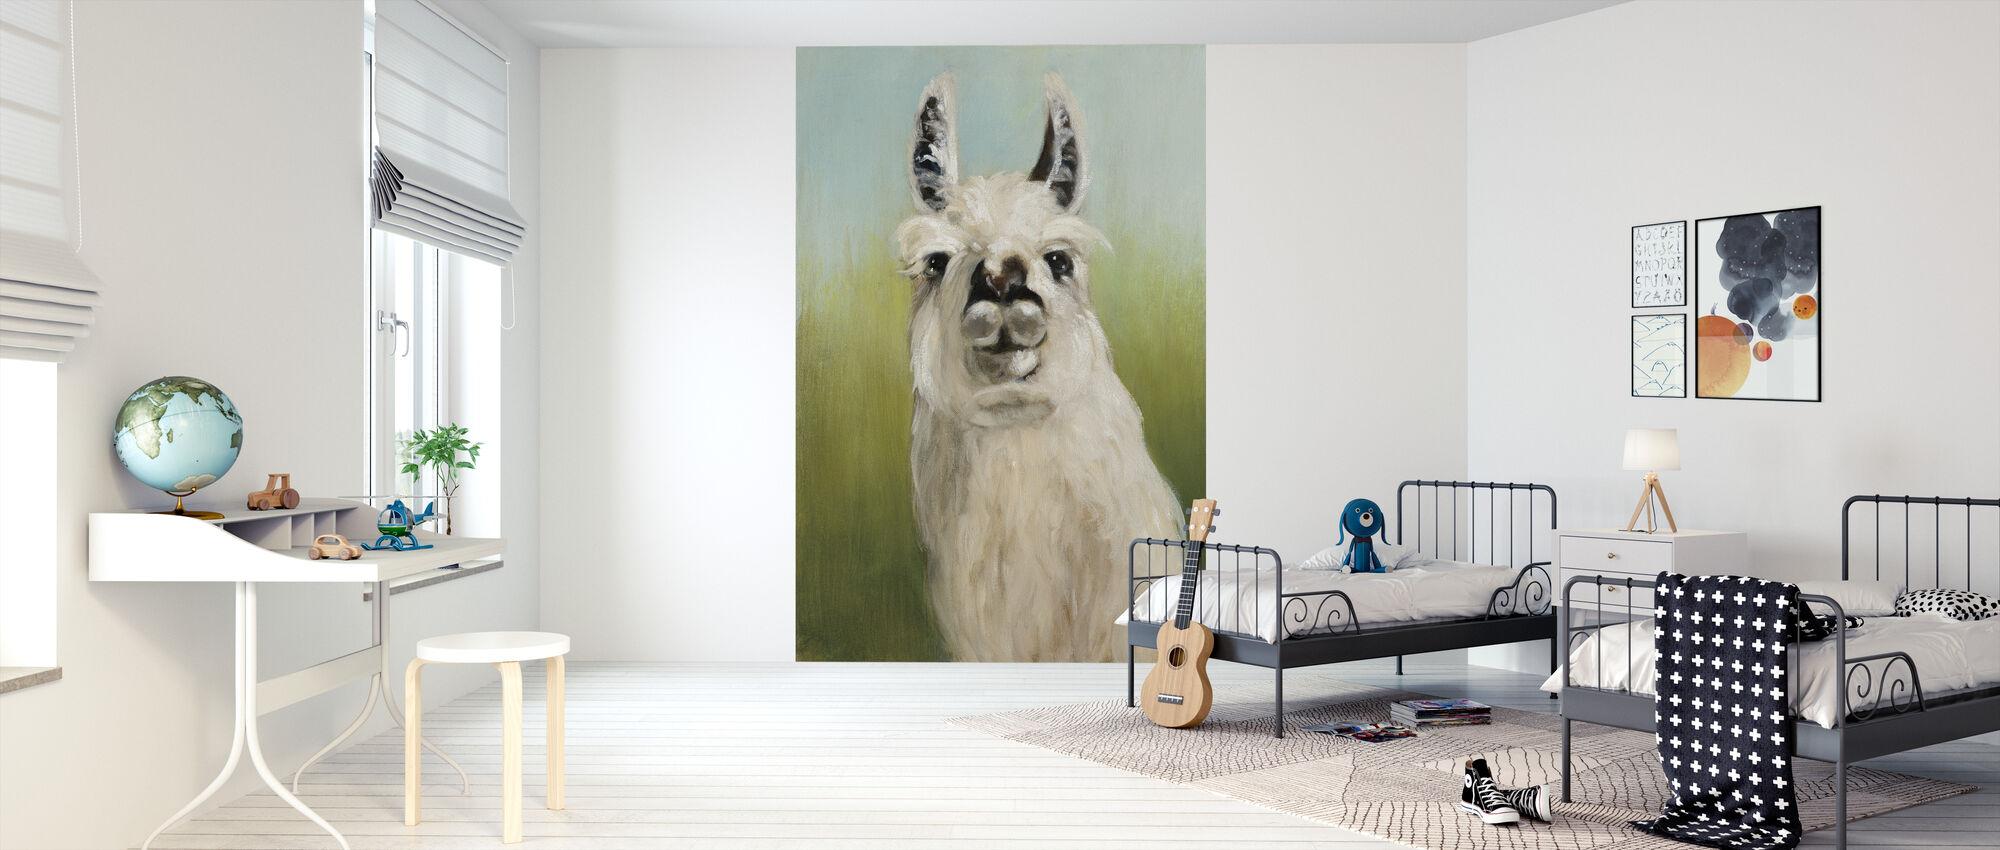 Whos Your Llama - Wallpaper - Kids Room